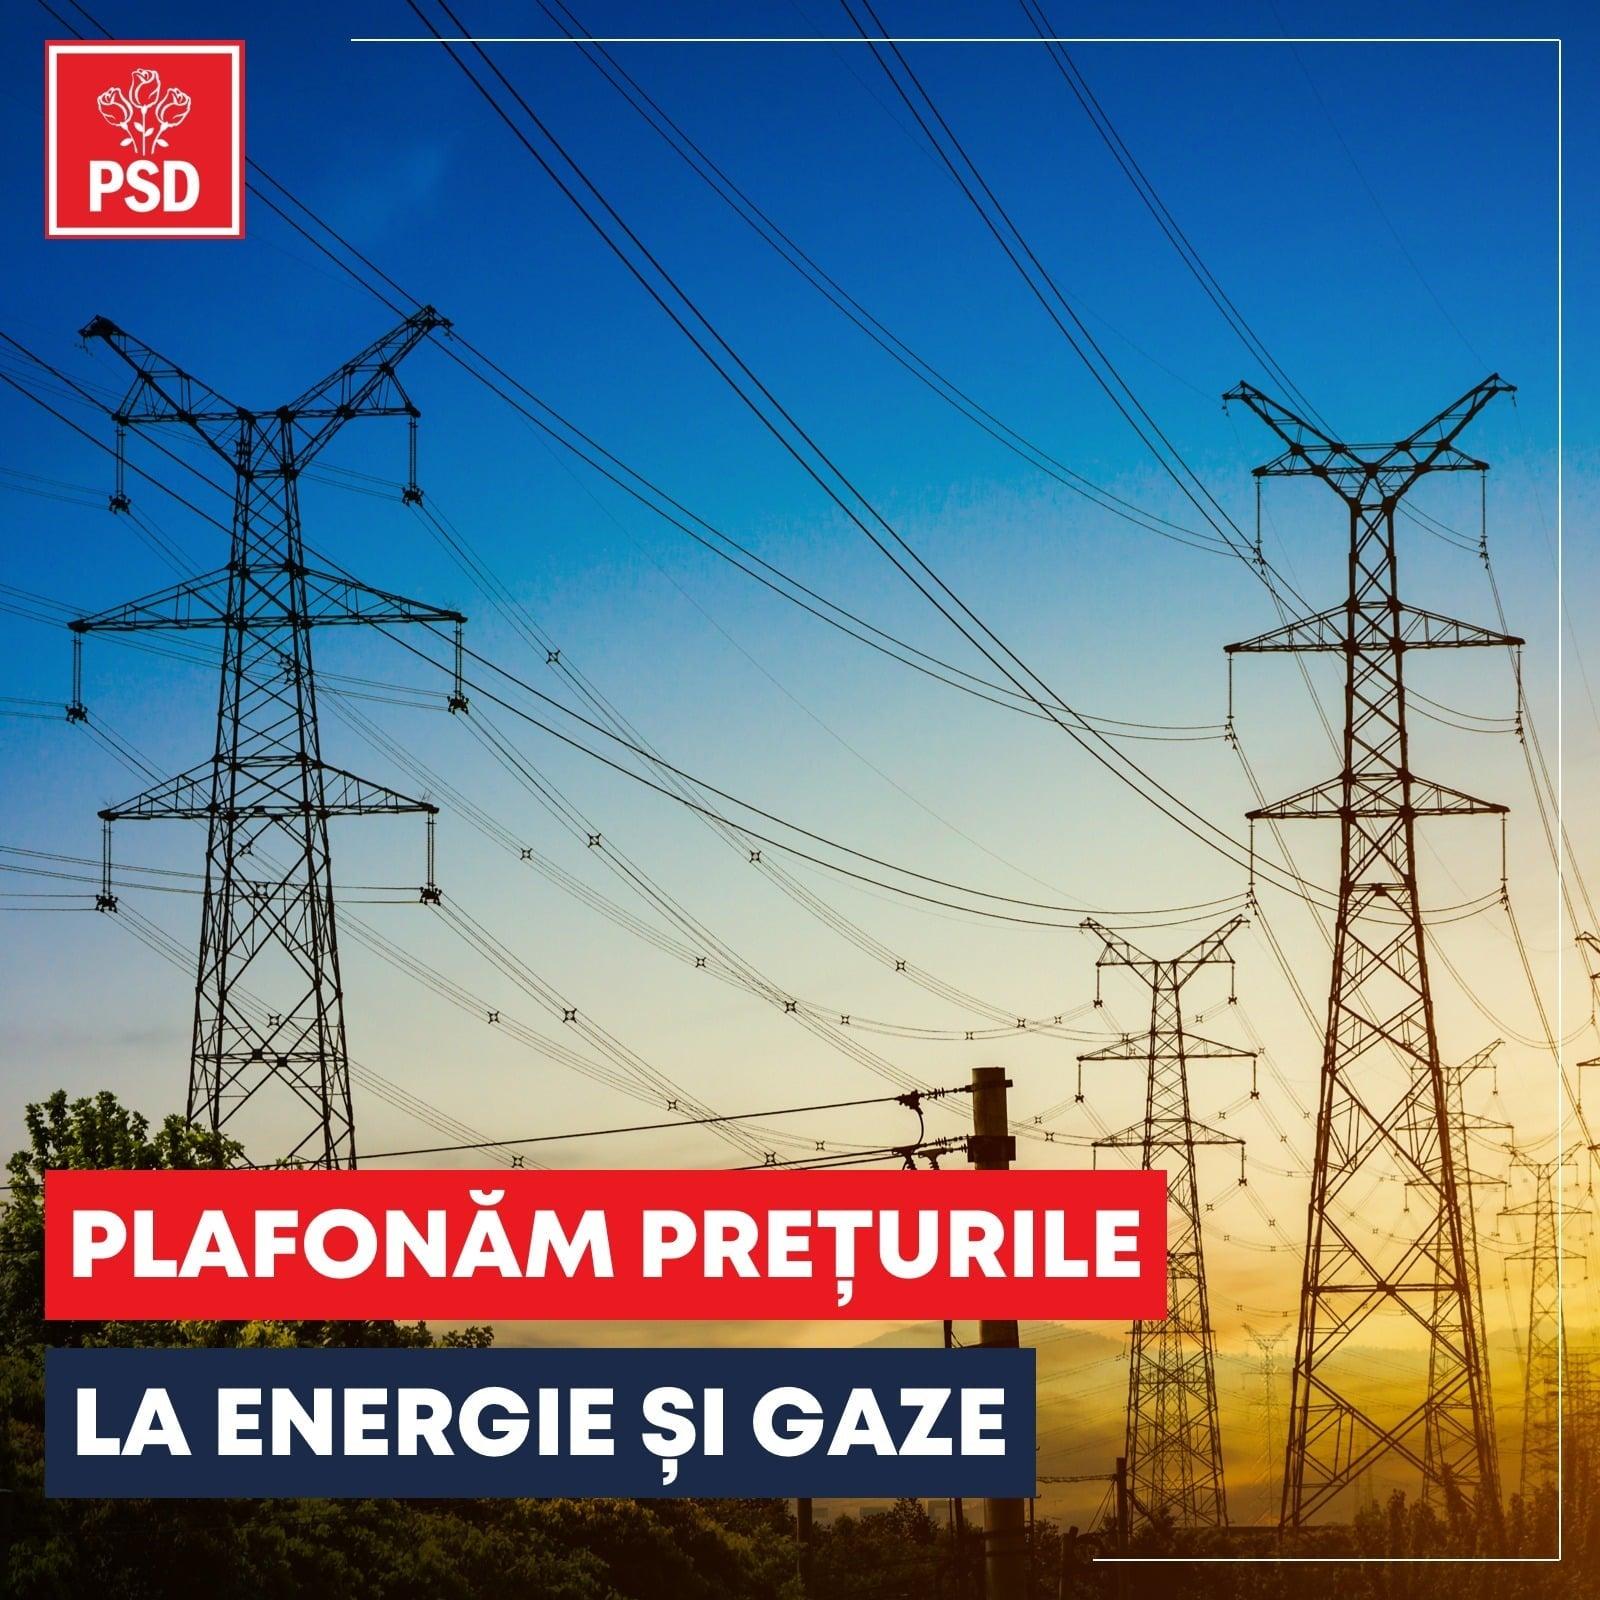 Plafonăm prețurile la energie și gaze!